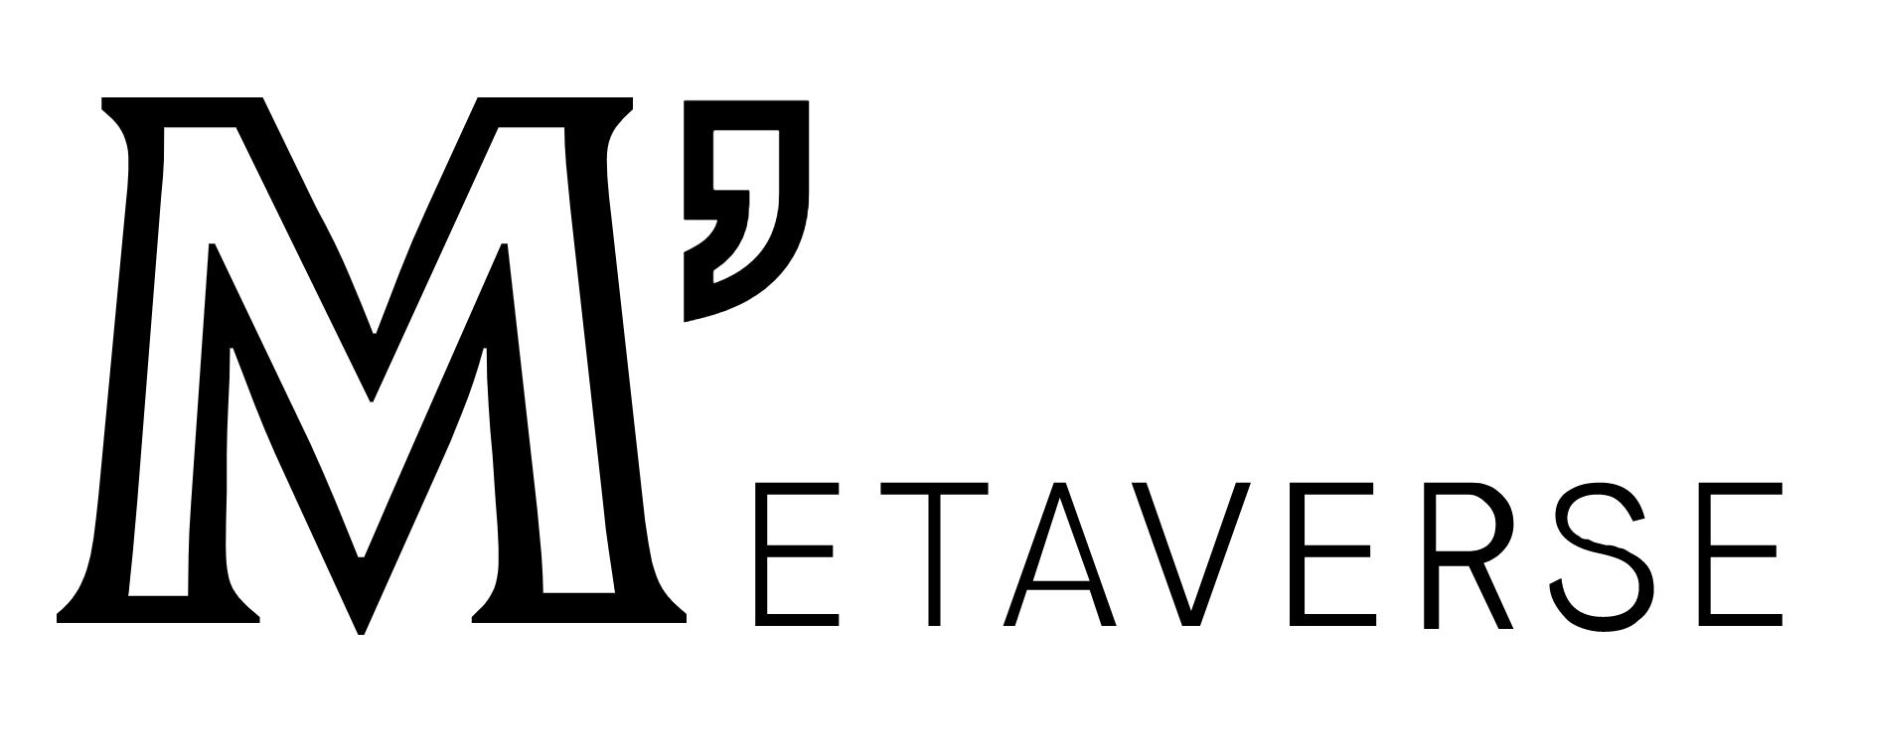 M'ETAVERSE